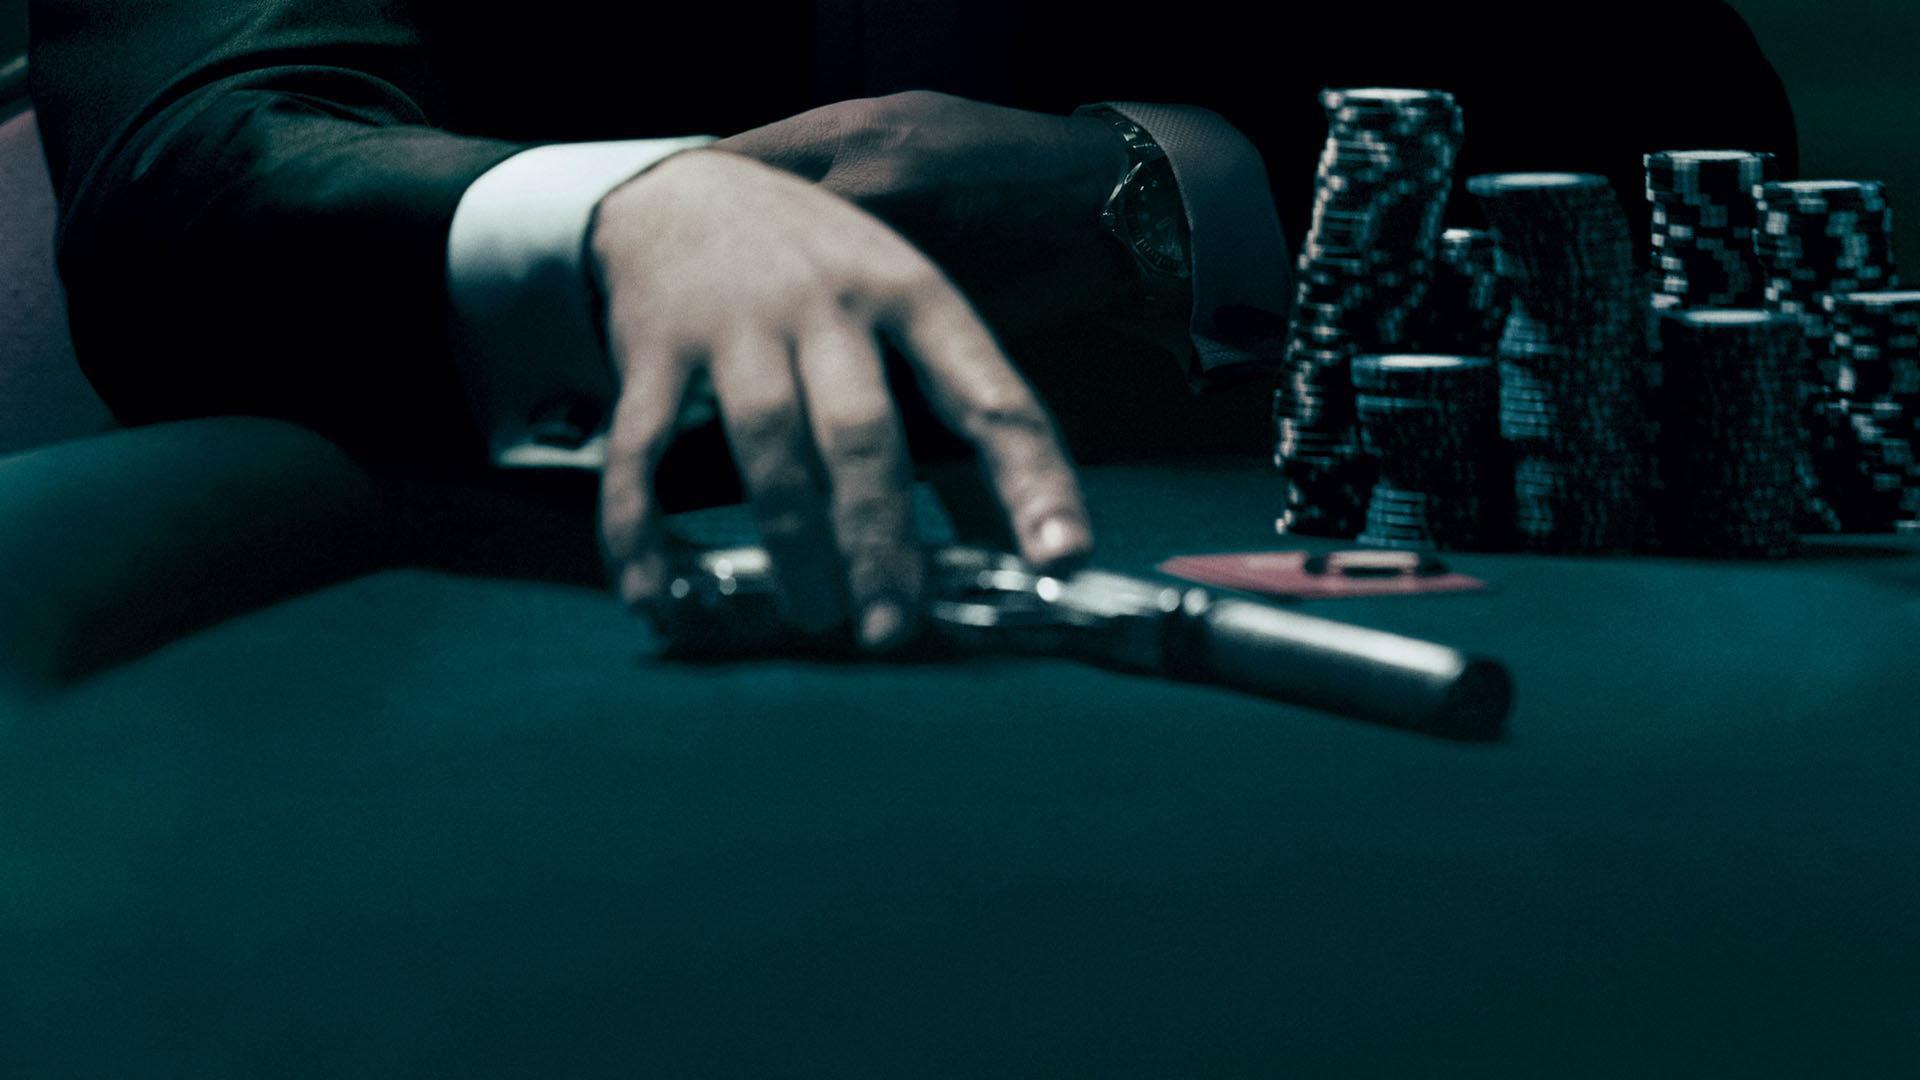 poker resimleri hd wallpapers - photo #17